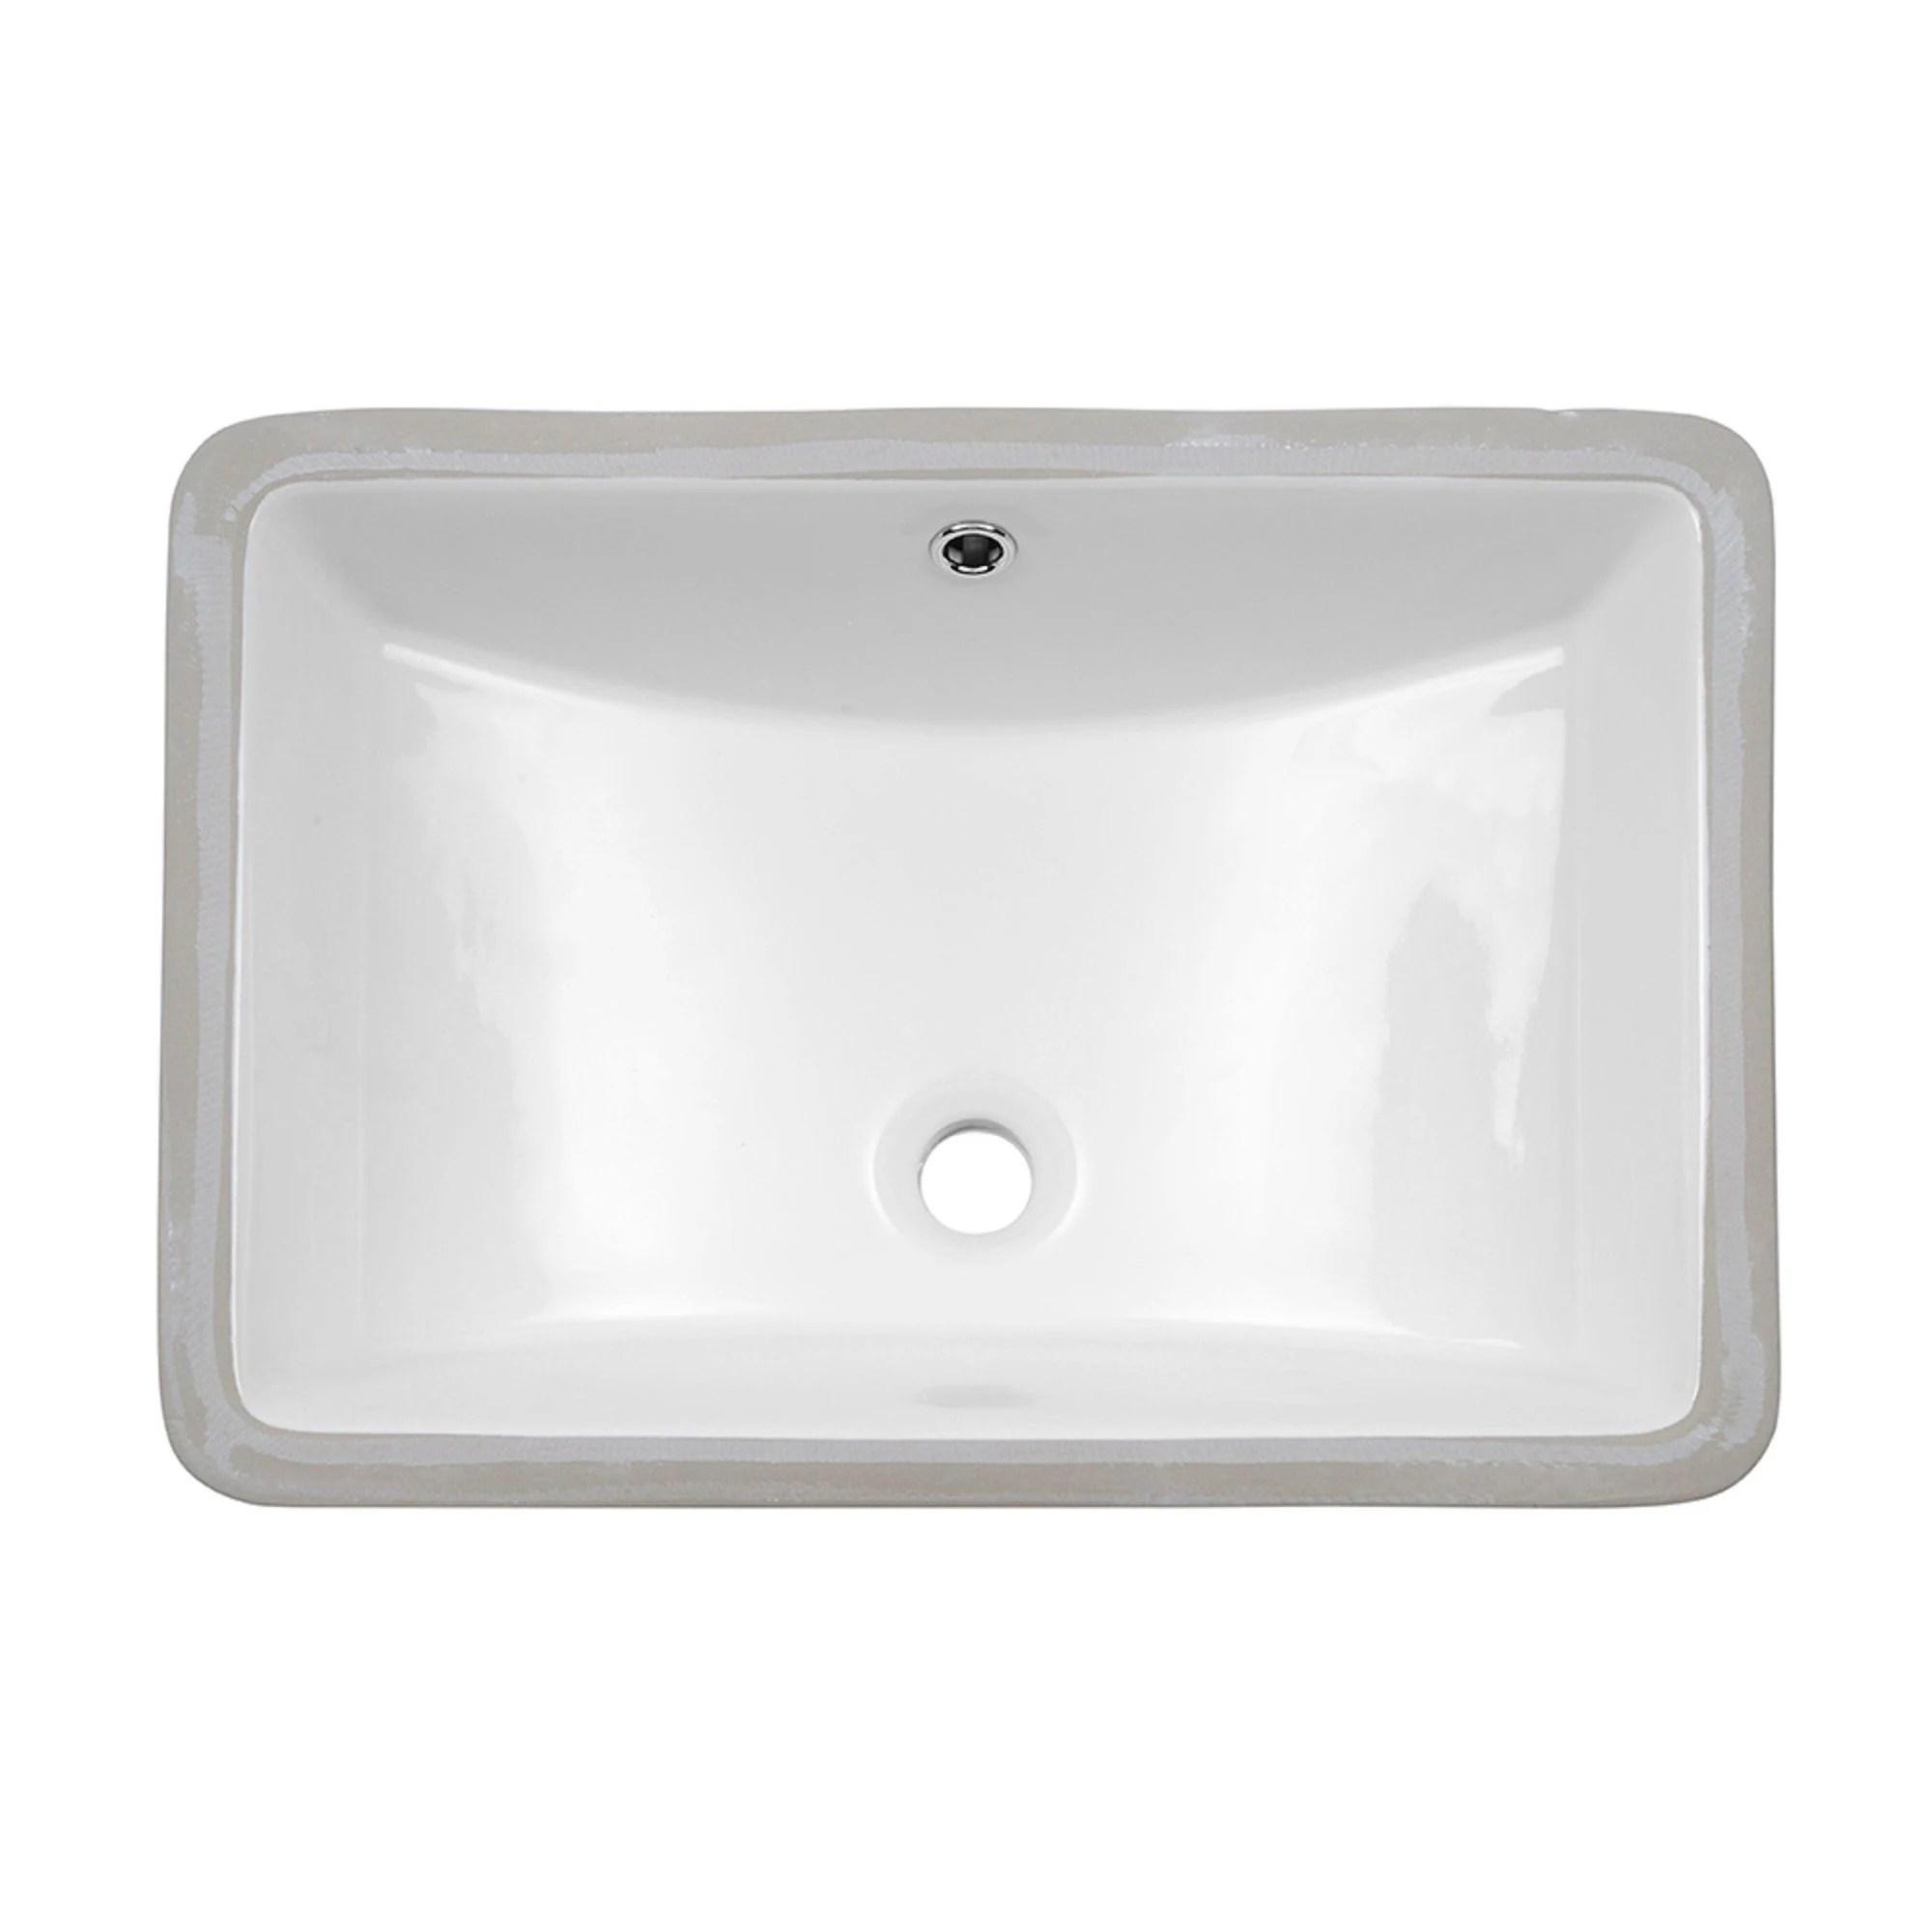 lordear 21 undermount vessel sink rectangle porcelain ceramic lavatory bathroom vanity sink 21 inch